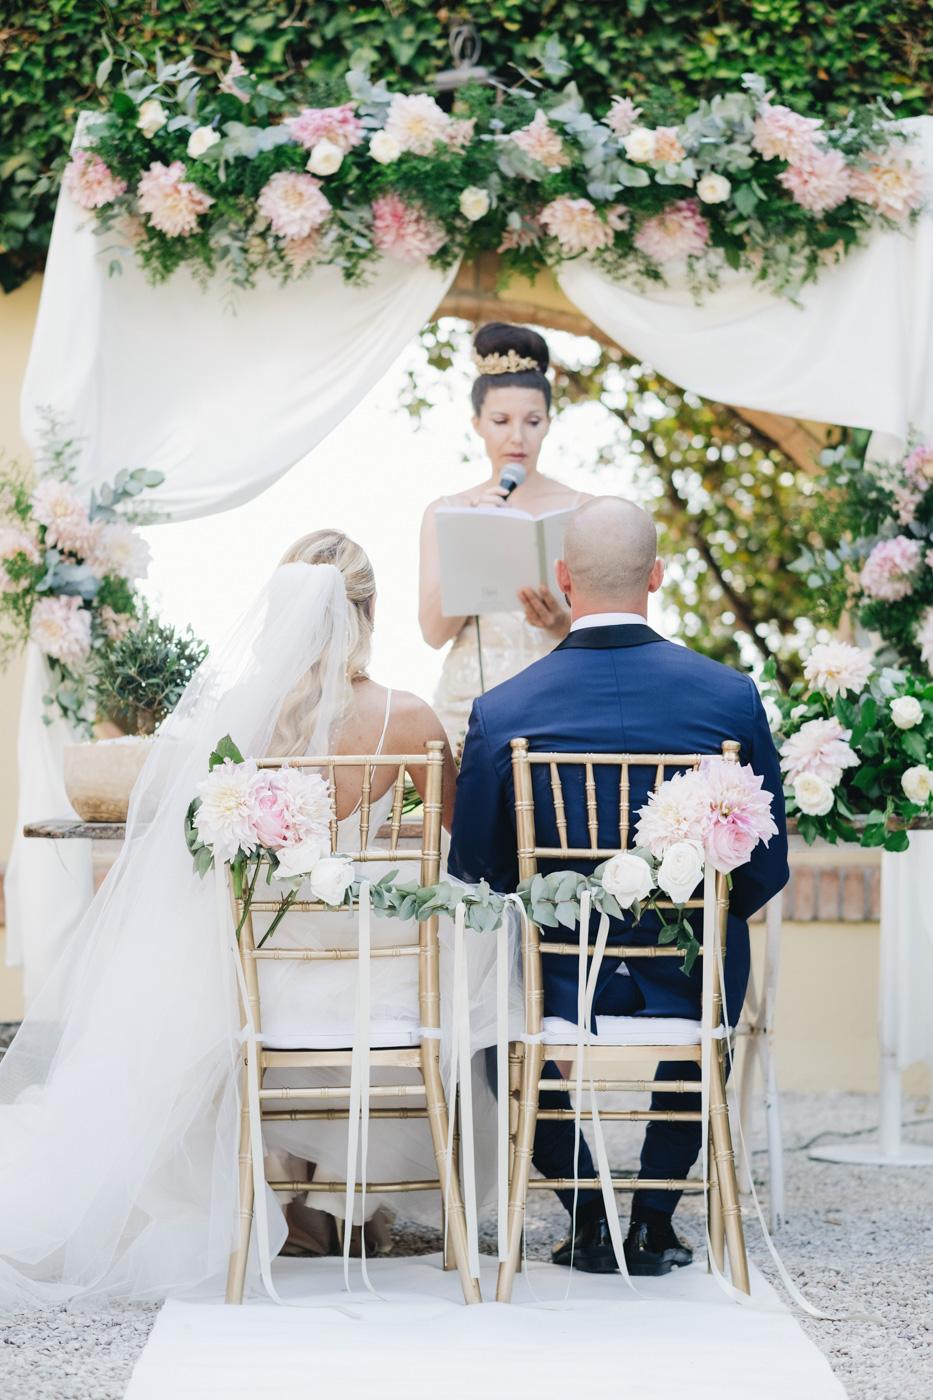 Matrimoni all'italiana wedding photographer italy-70.jpg